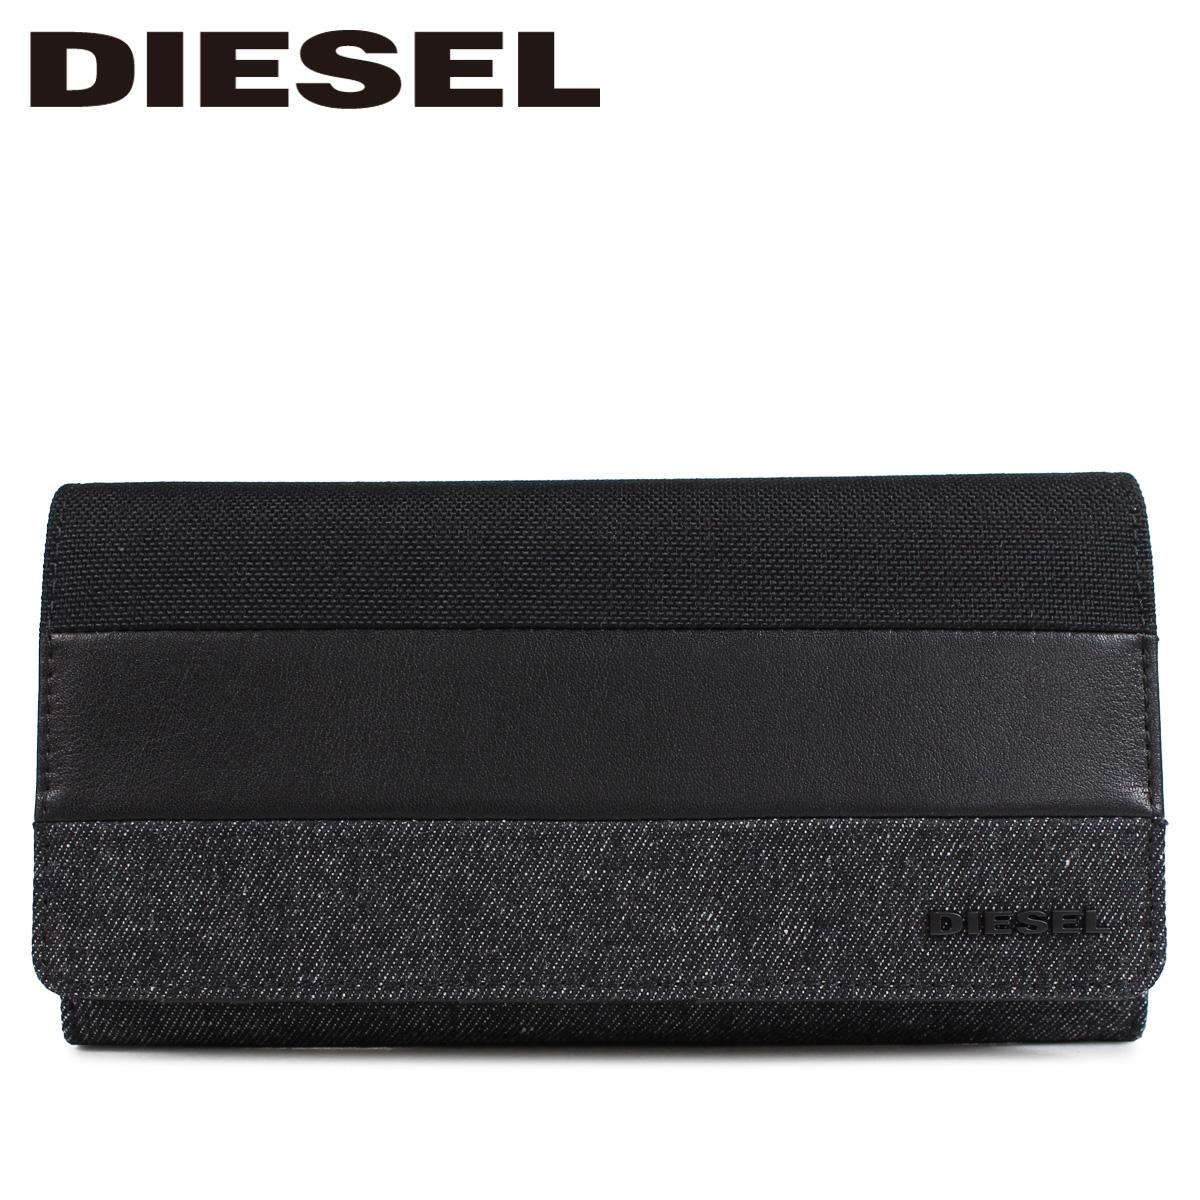 DIESEL ディーゼル 財布 長財布 メンズ 二つ折り METROPOLETY 24 A DAY グレー X05802 P1830